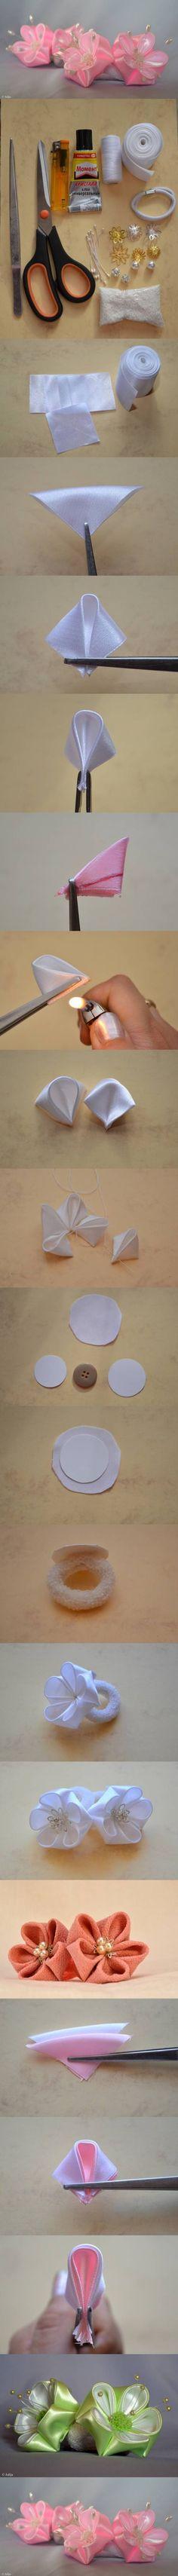 DIY Round Petals Ribbon Flower DIY Projects